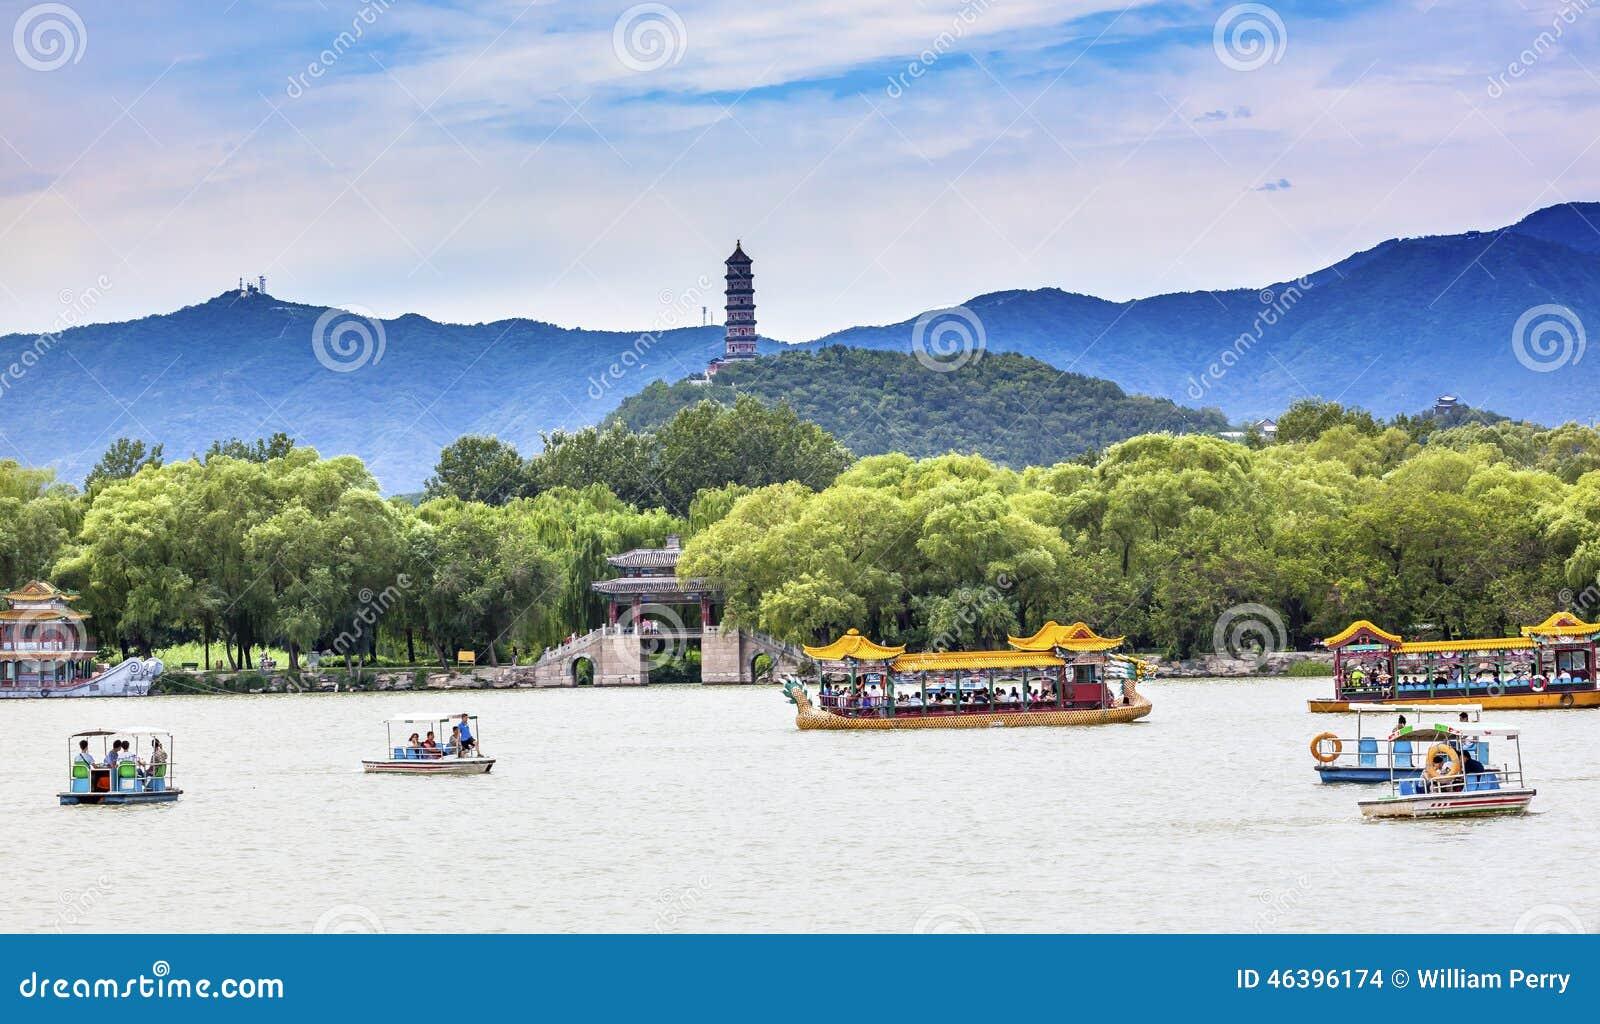 Yue Feng Pagoda Lake Boats Summer-Paleis Peking China